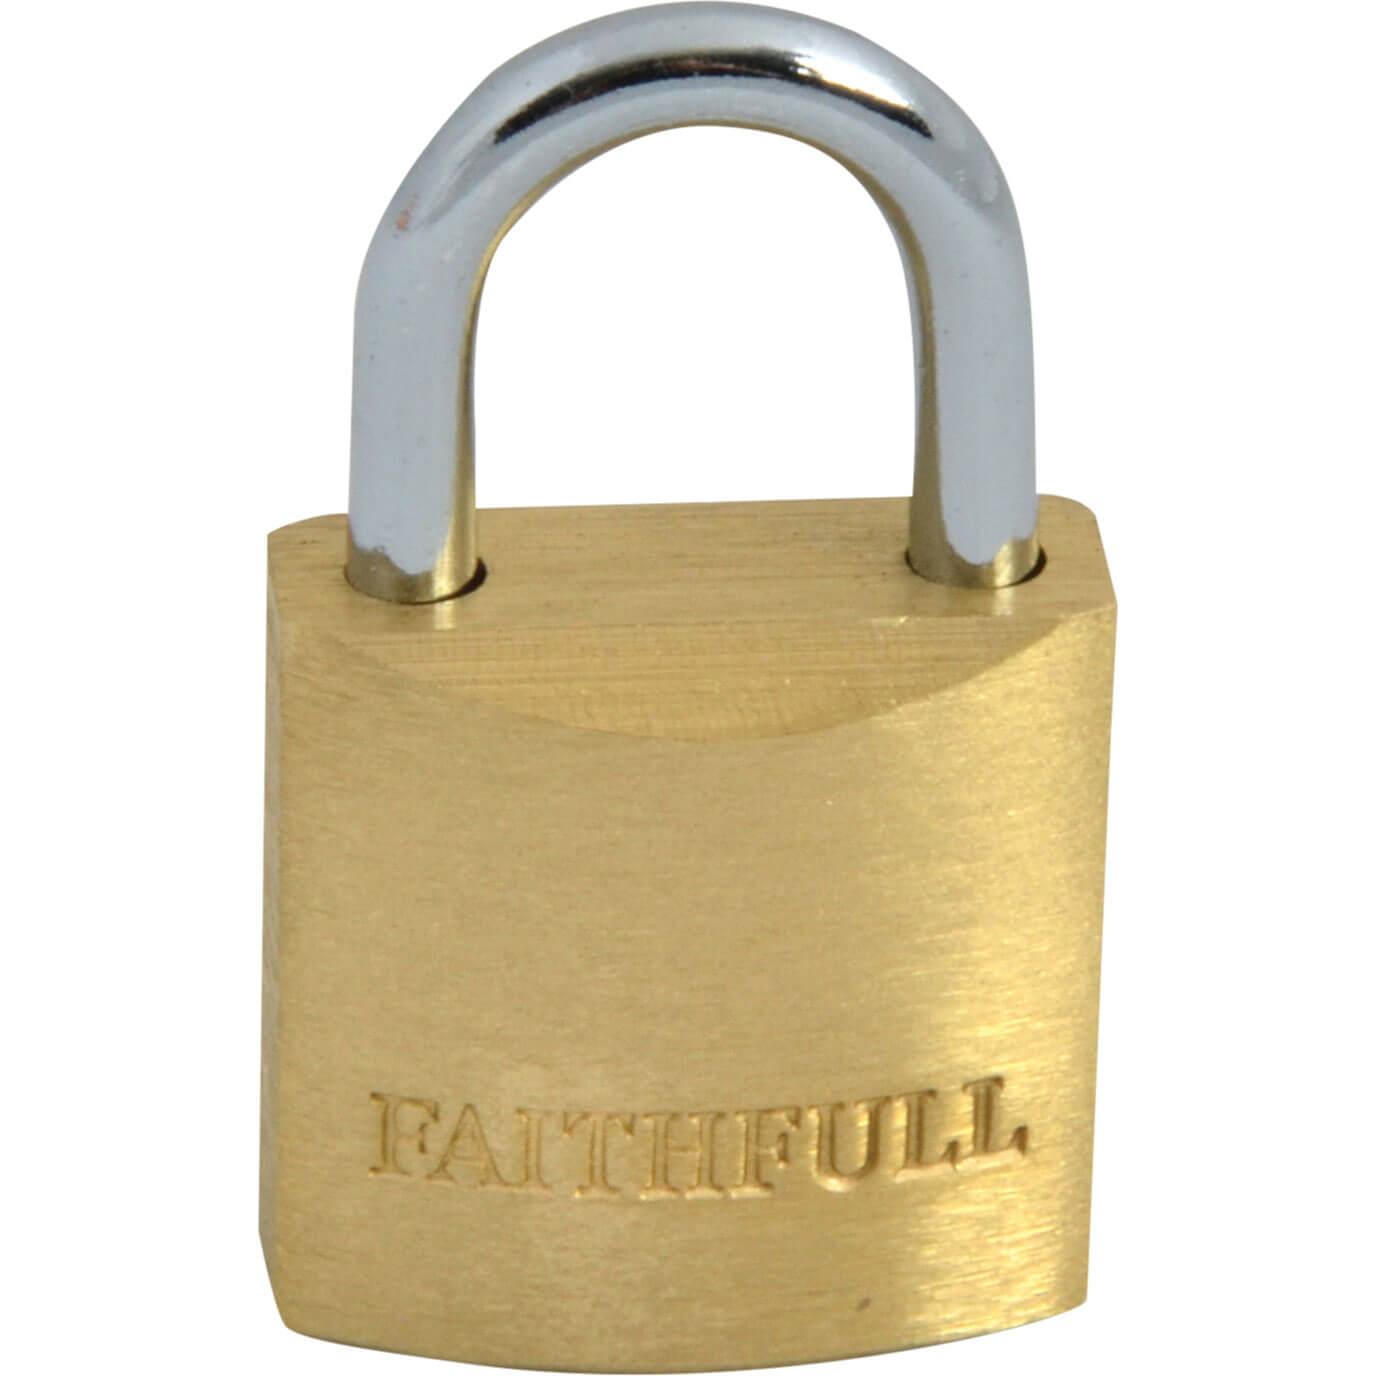 Tooled Up/Ironmongery & Security/Security/Faithfull 20mm Brass Padlock